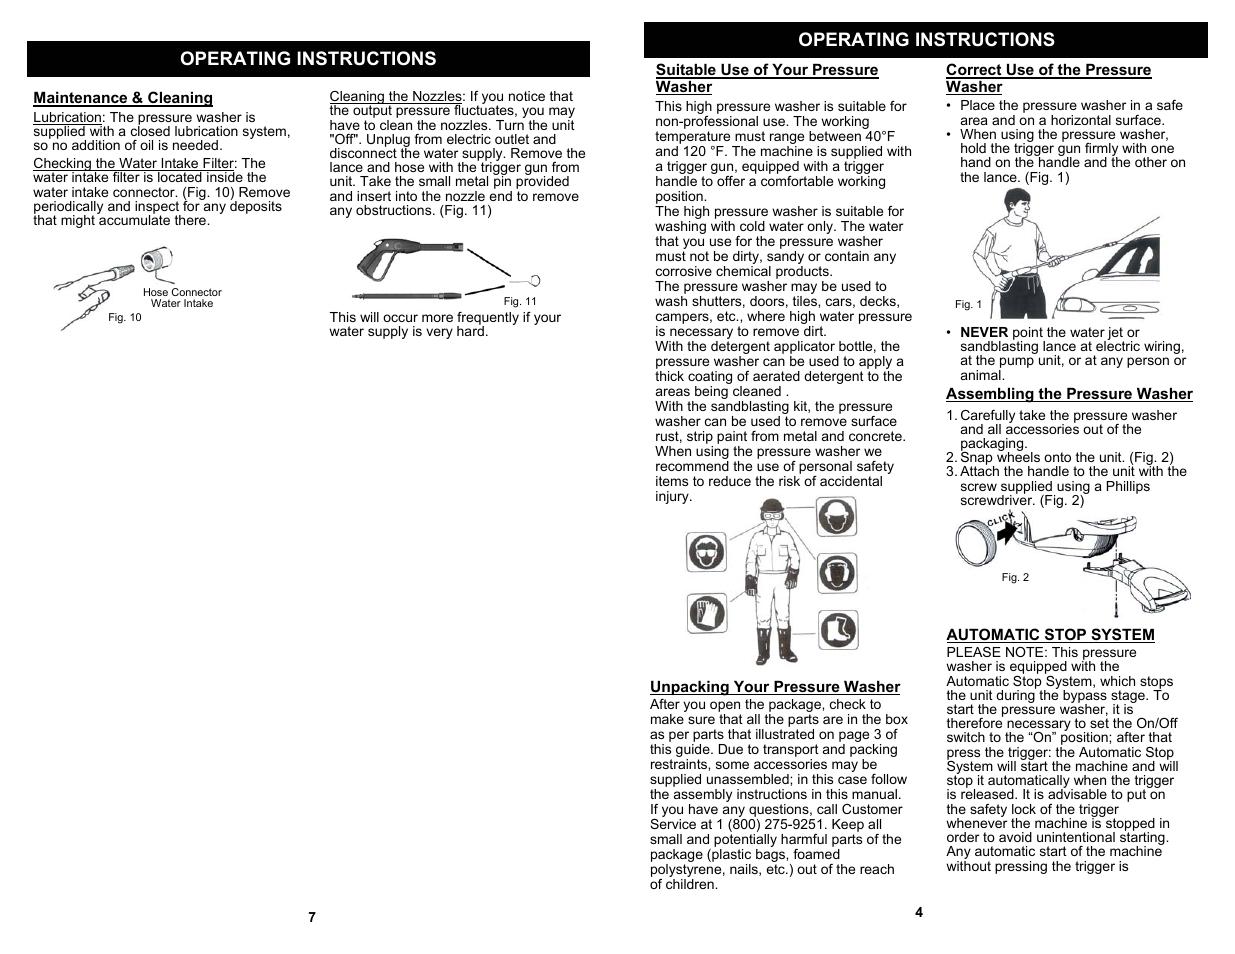 Operating instructions | Fantom Vacuum FANTOM VPW40H User